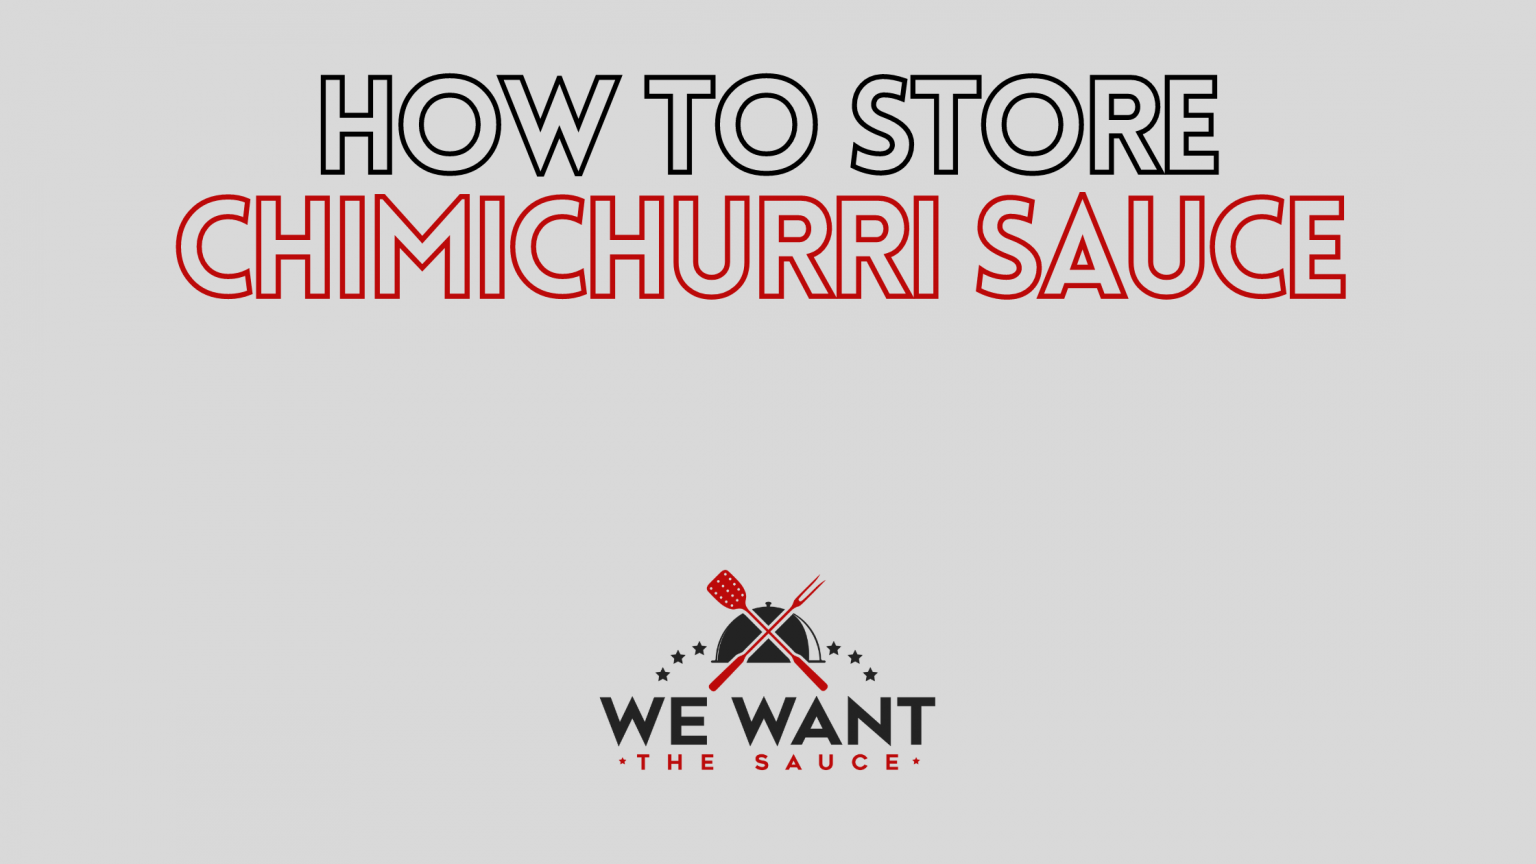 How To Store Chimichurri Sauce